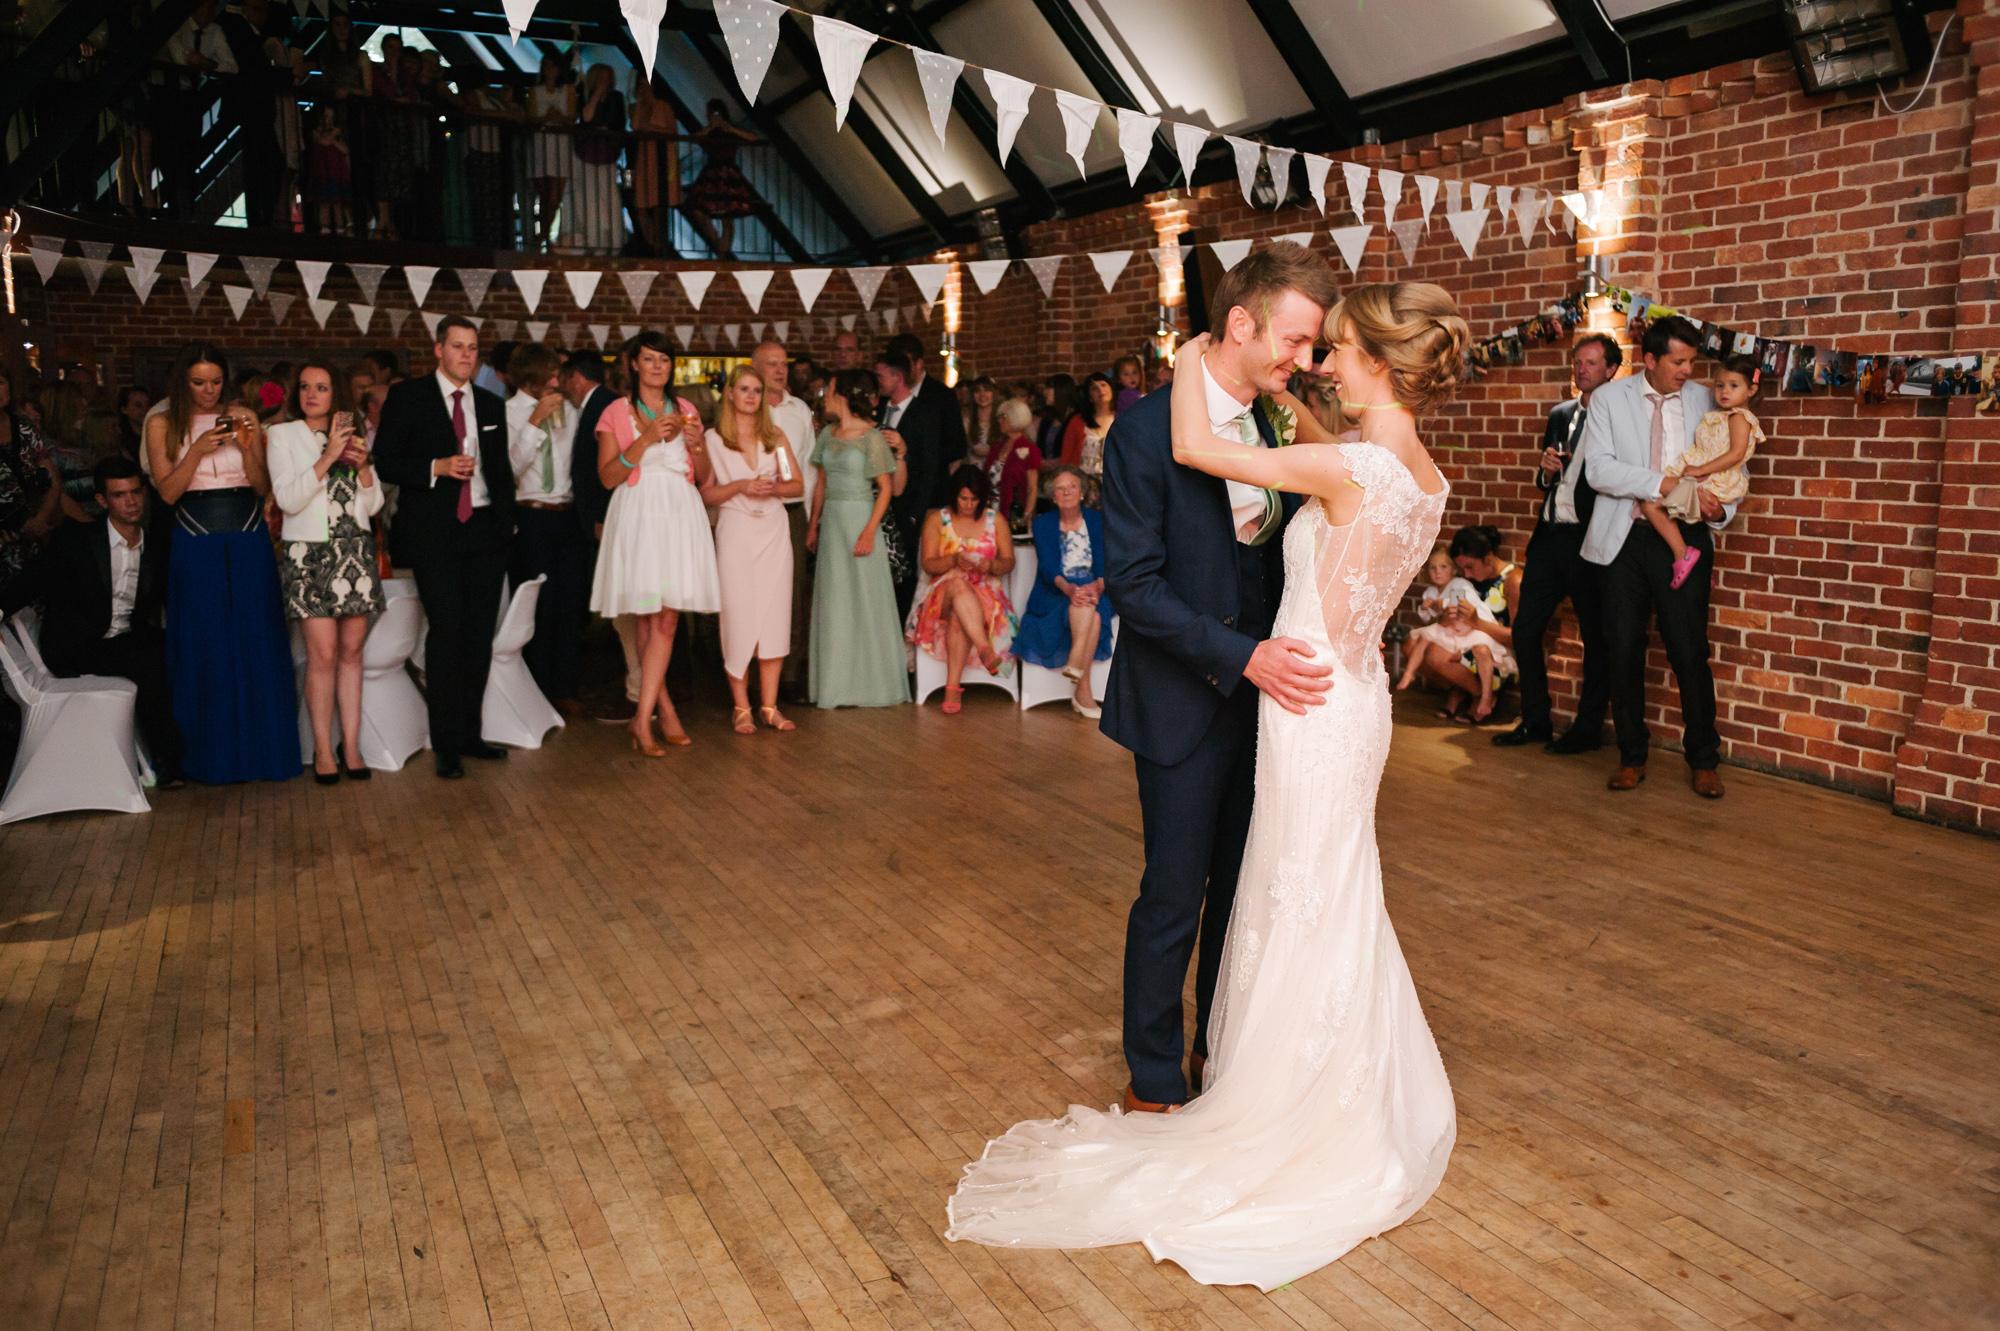 Cricket Club Wedding Tea Party Eversholt Bedfordshire-91